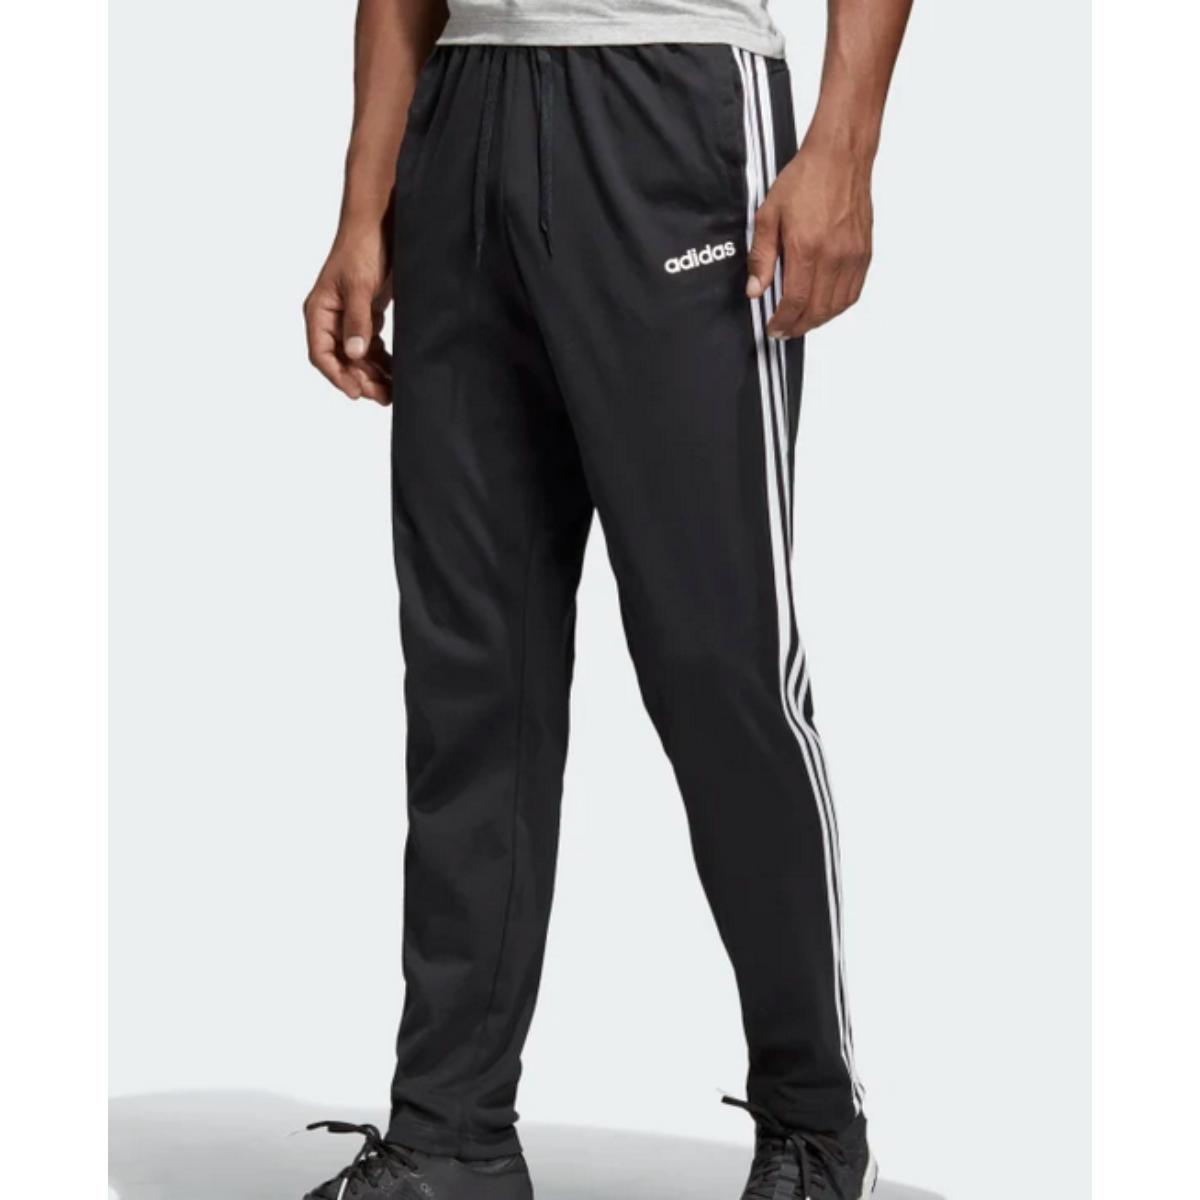 Calça Masculina Adidas Du0456 e 3s t Pnt Preto/branco